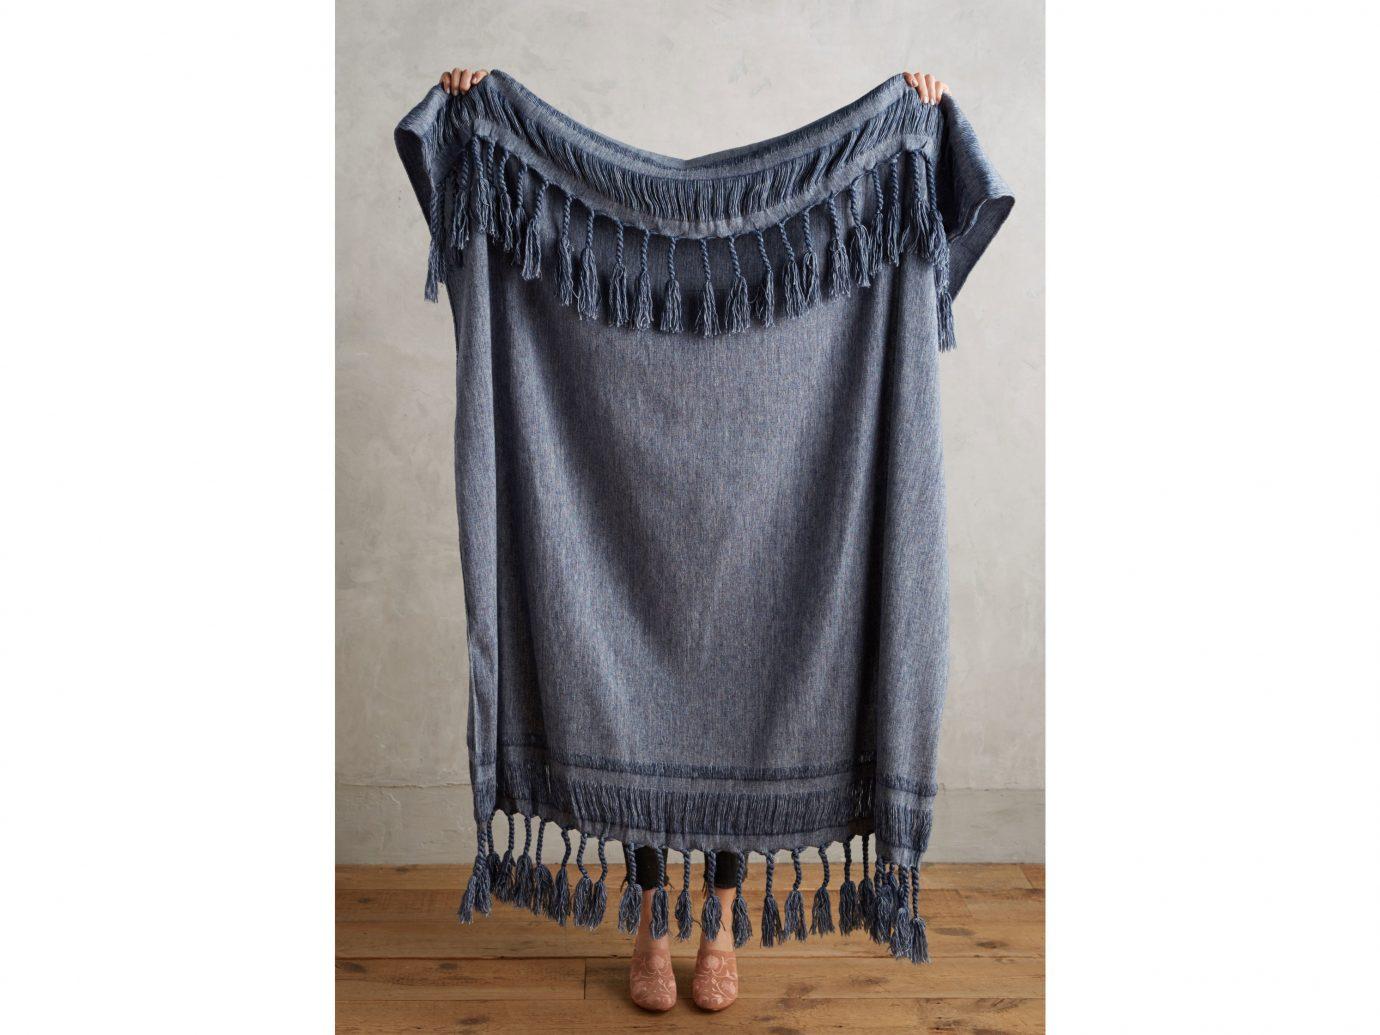 Style + Design clothing sleeve dress t shirt pattern textile Design blouse outerwear neck pocket denim shirt gown cocktail dress abdomen